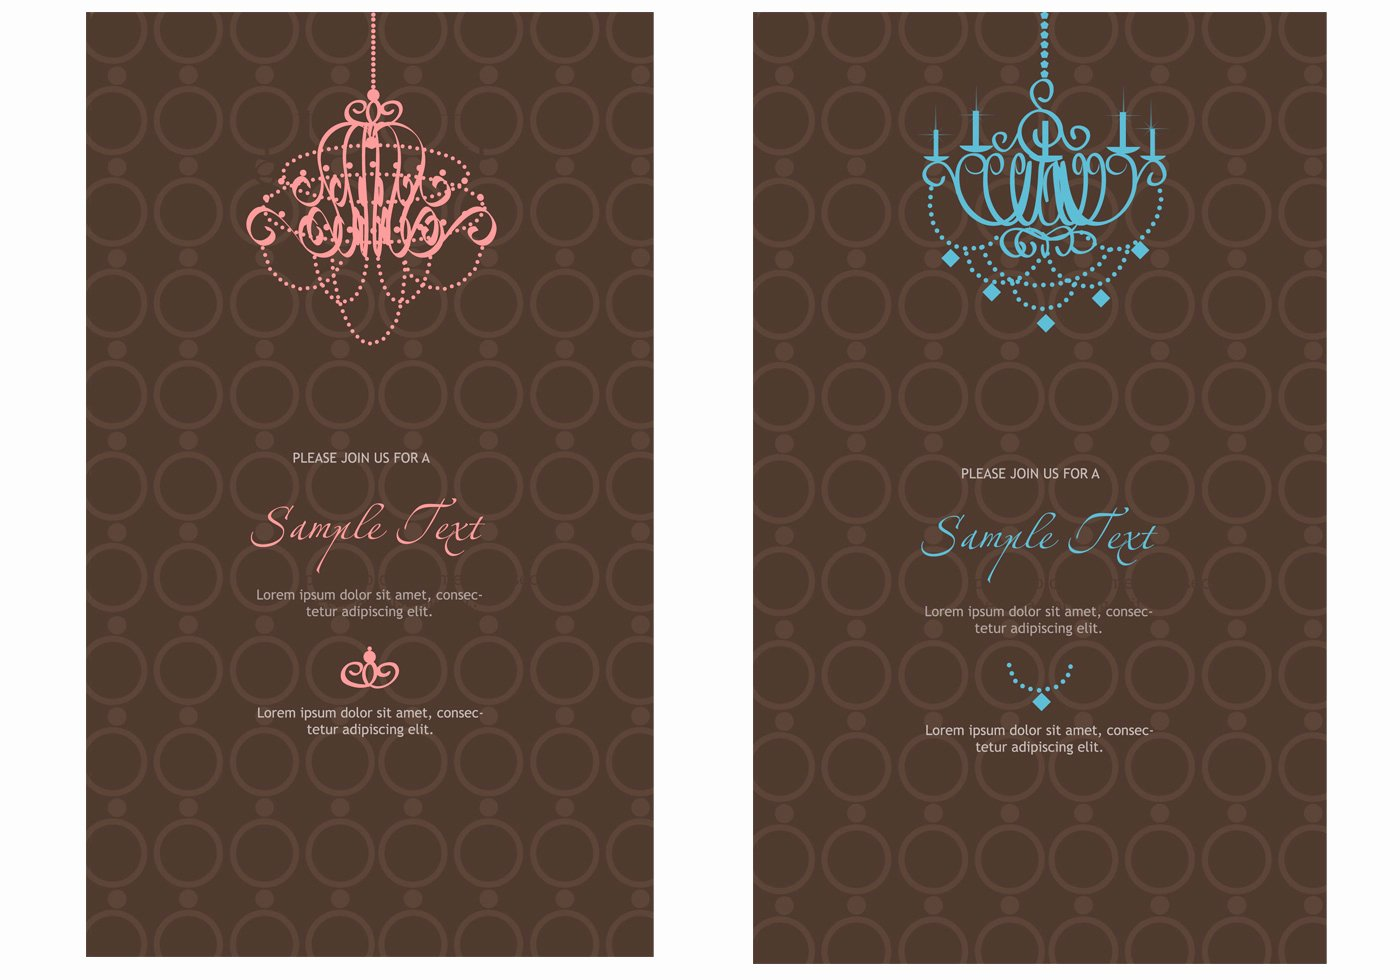 Photoshop Birthday Invitation Template Beautiful Invitation Template Elegant Shop Invitation Free